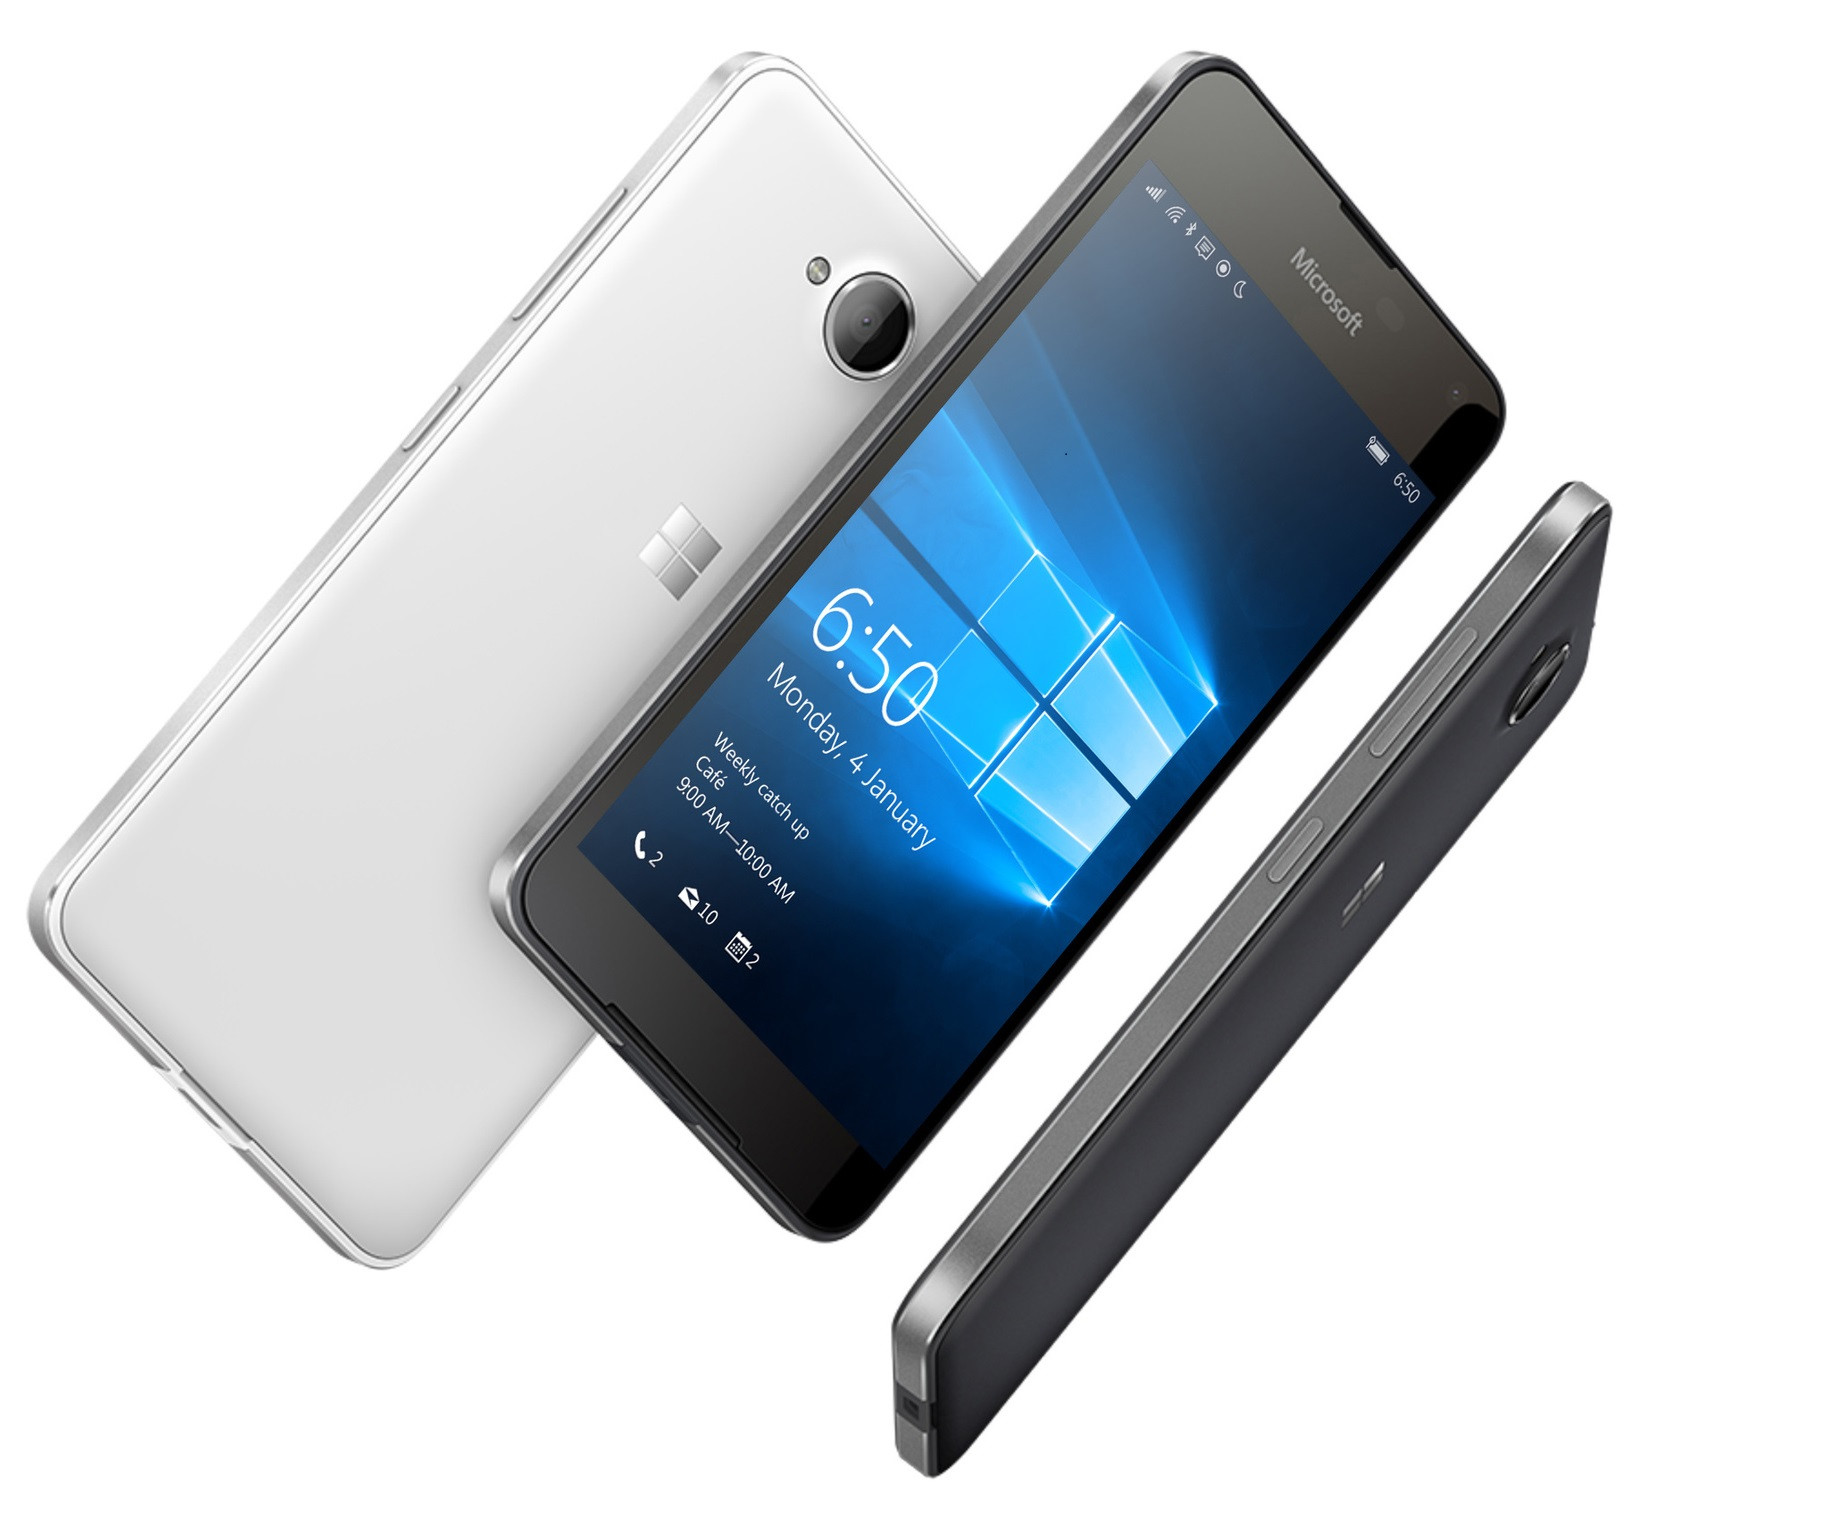 1455537985_lumia650-marketing-image-ssim-01-1.jpg